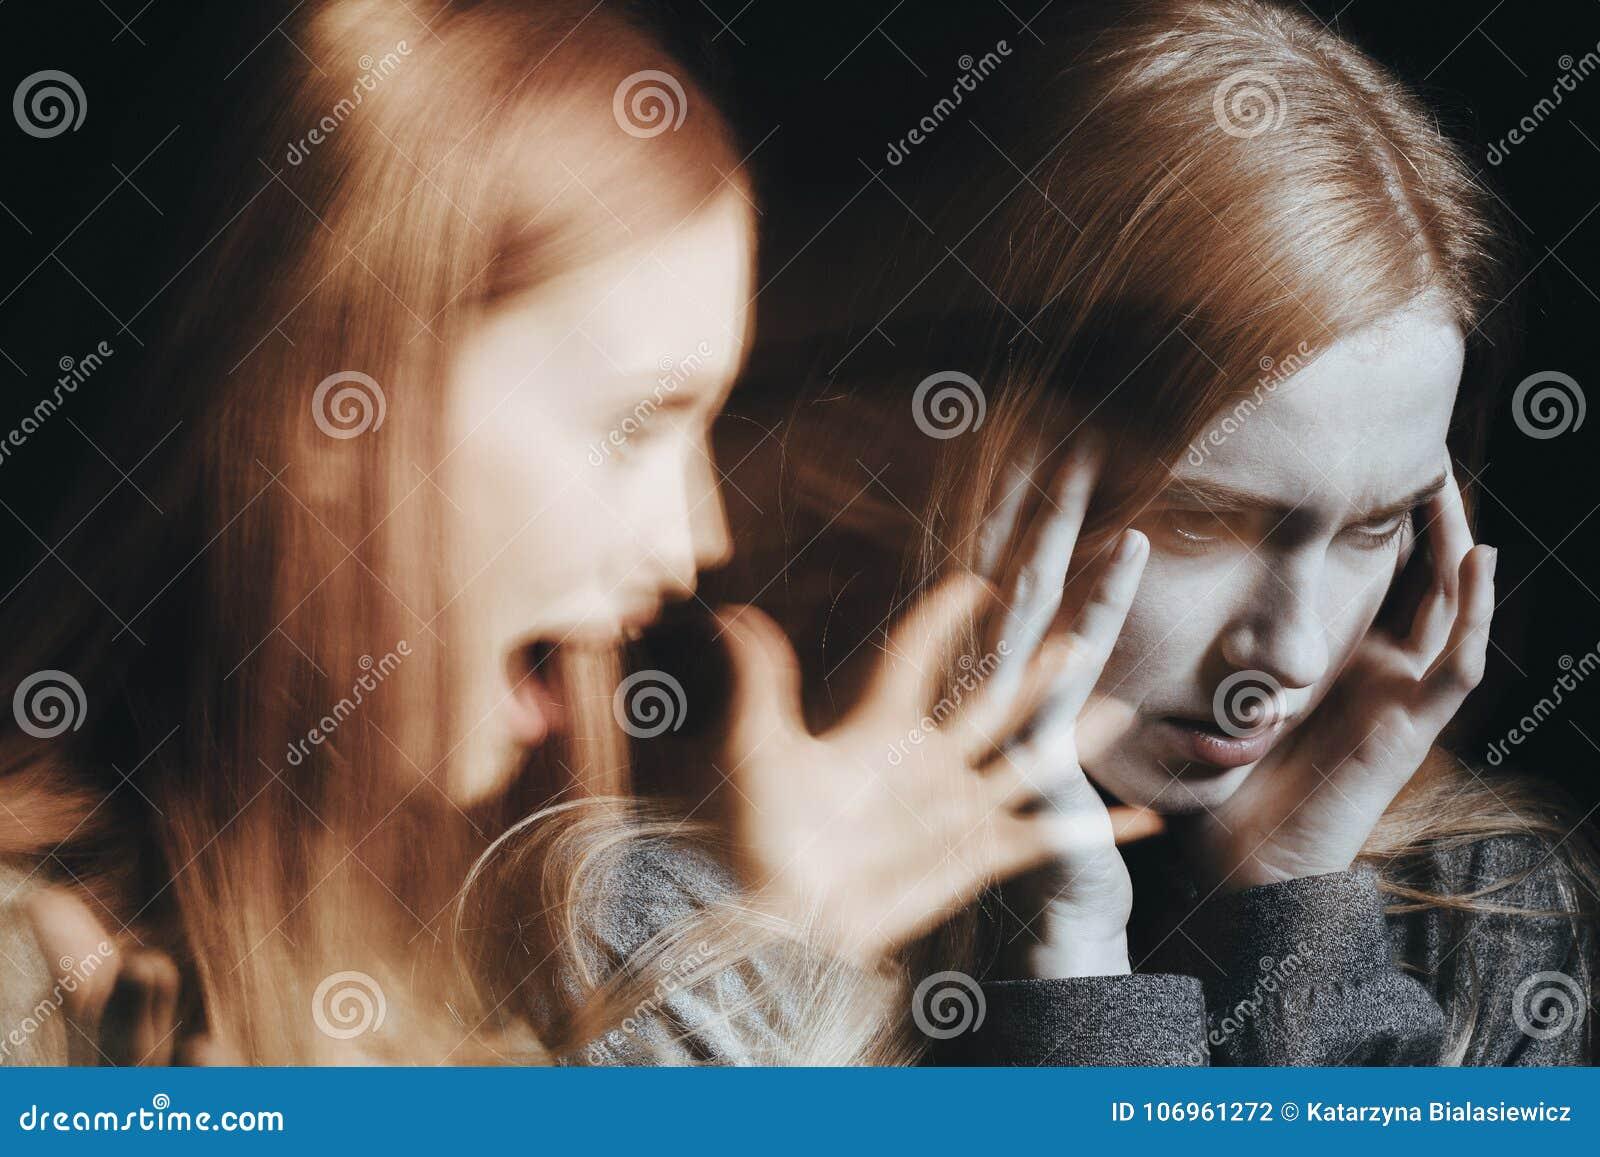 Meisje met schizofrenie die oren behandelen